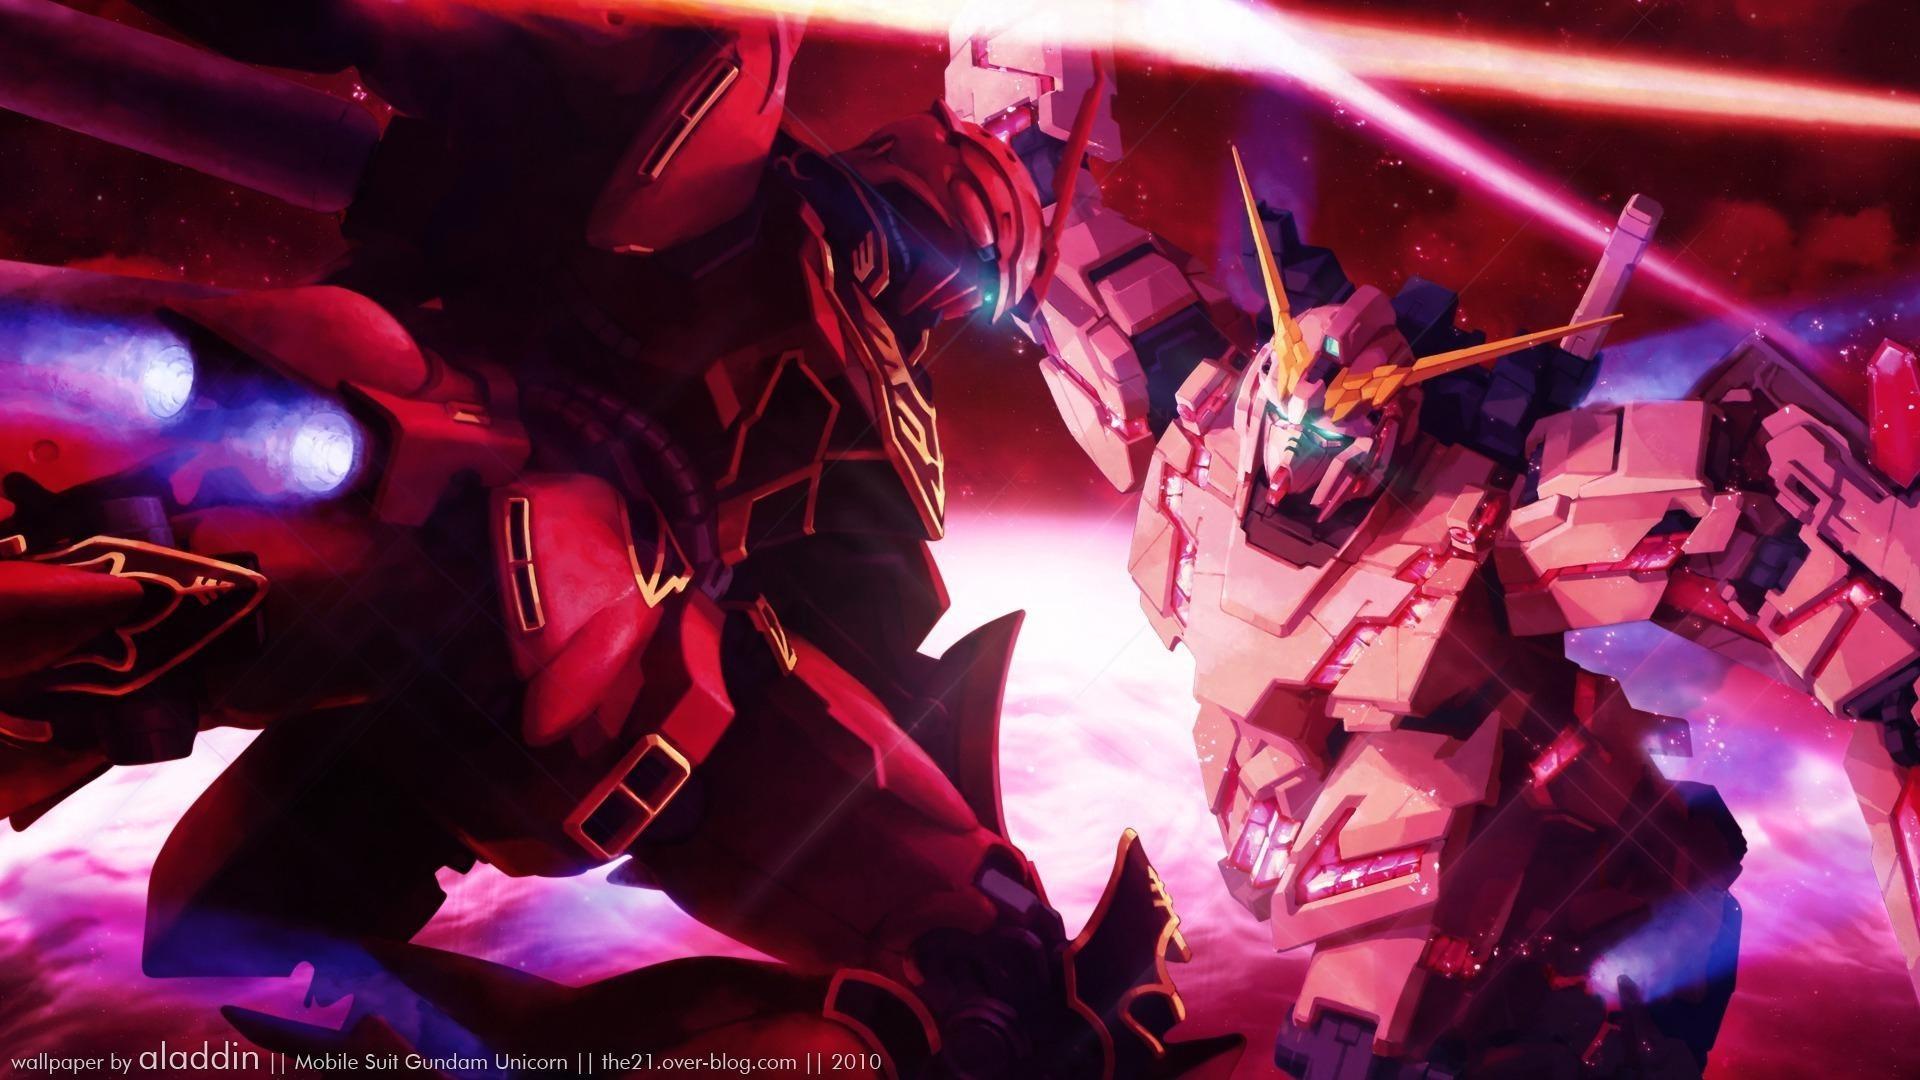 General Mobile Suit Gundam Unicorn RX-0 Unicorn Gundam Sinanju  Gundam